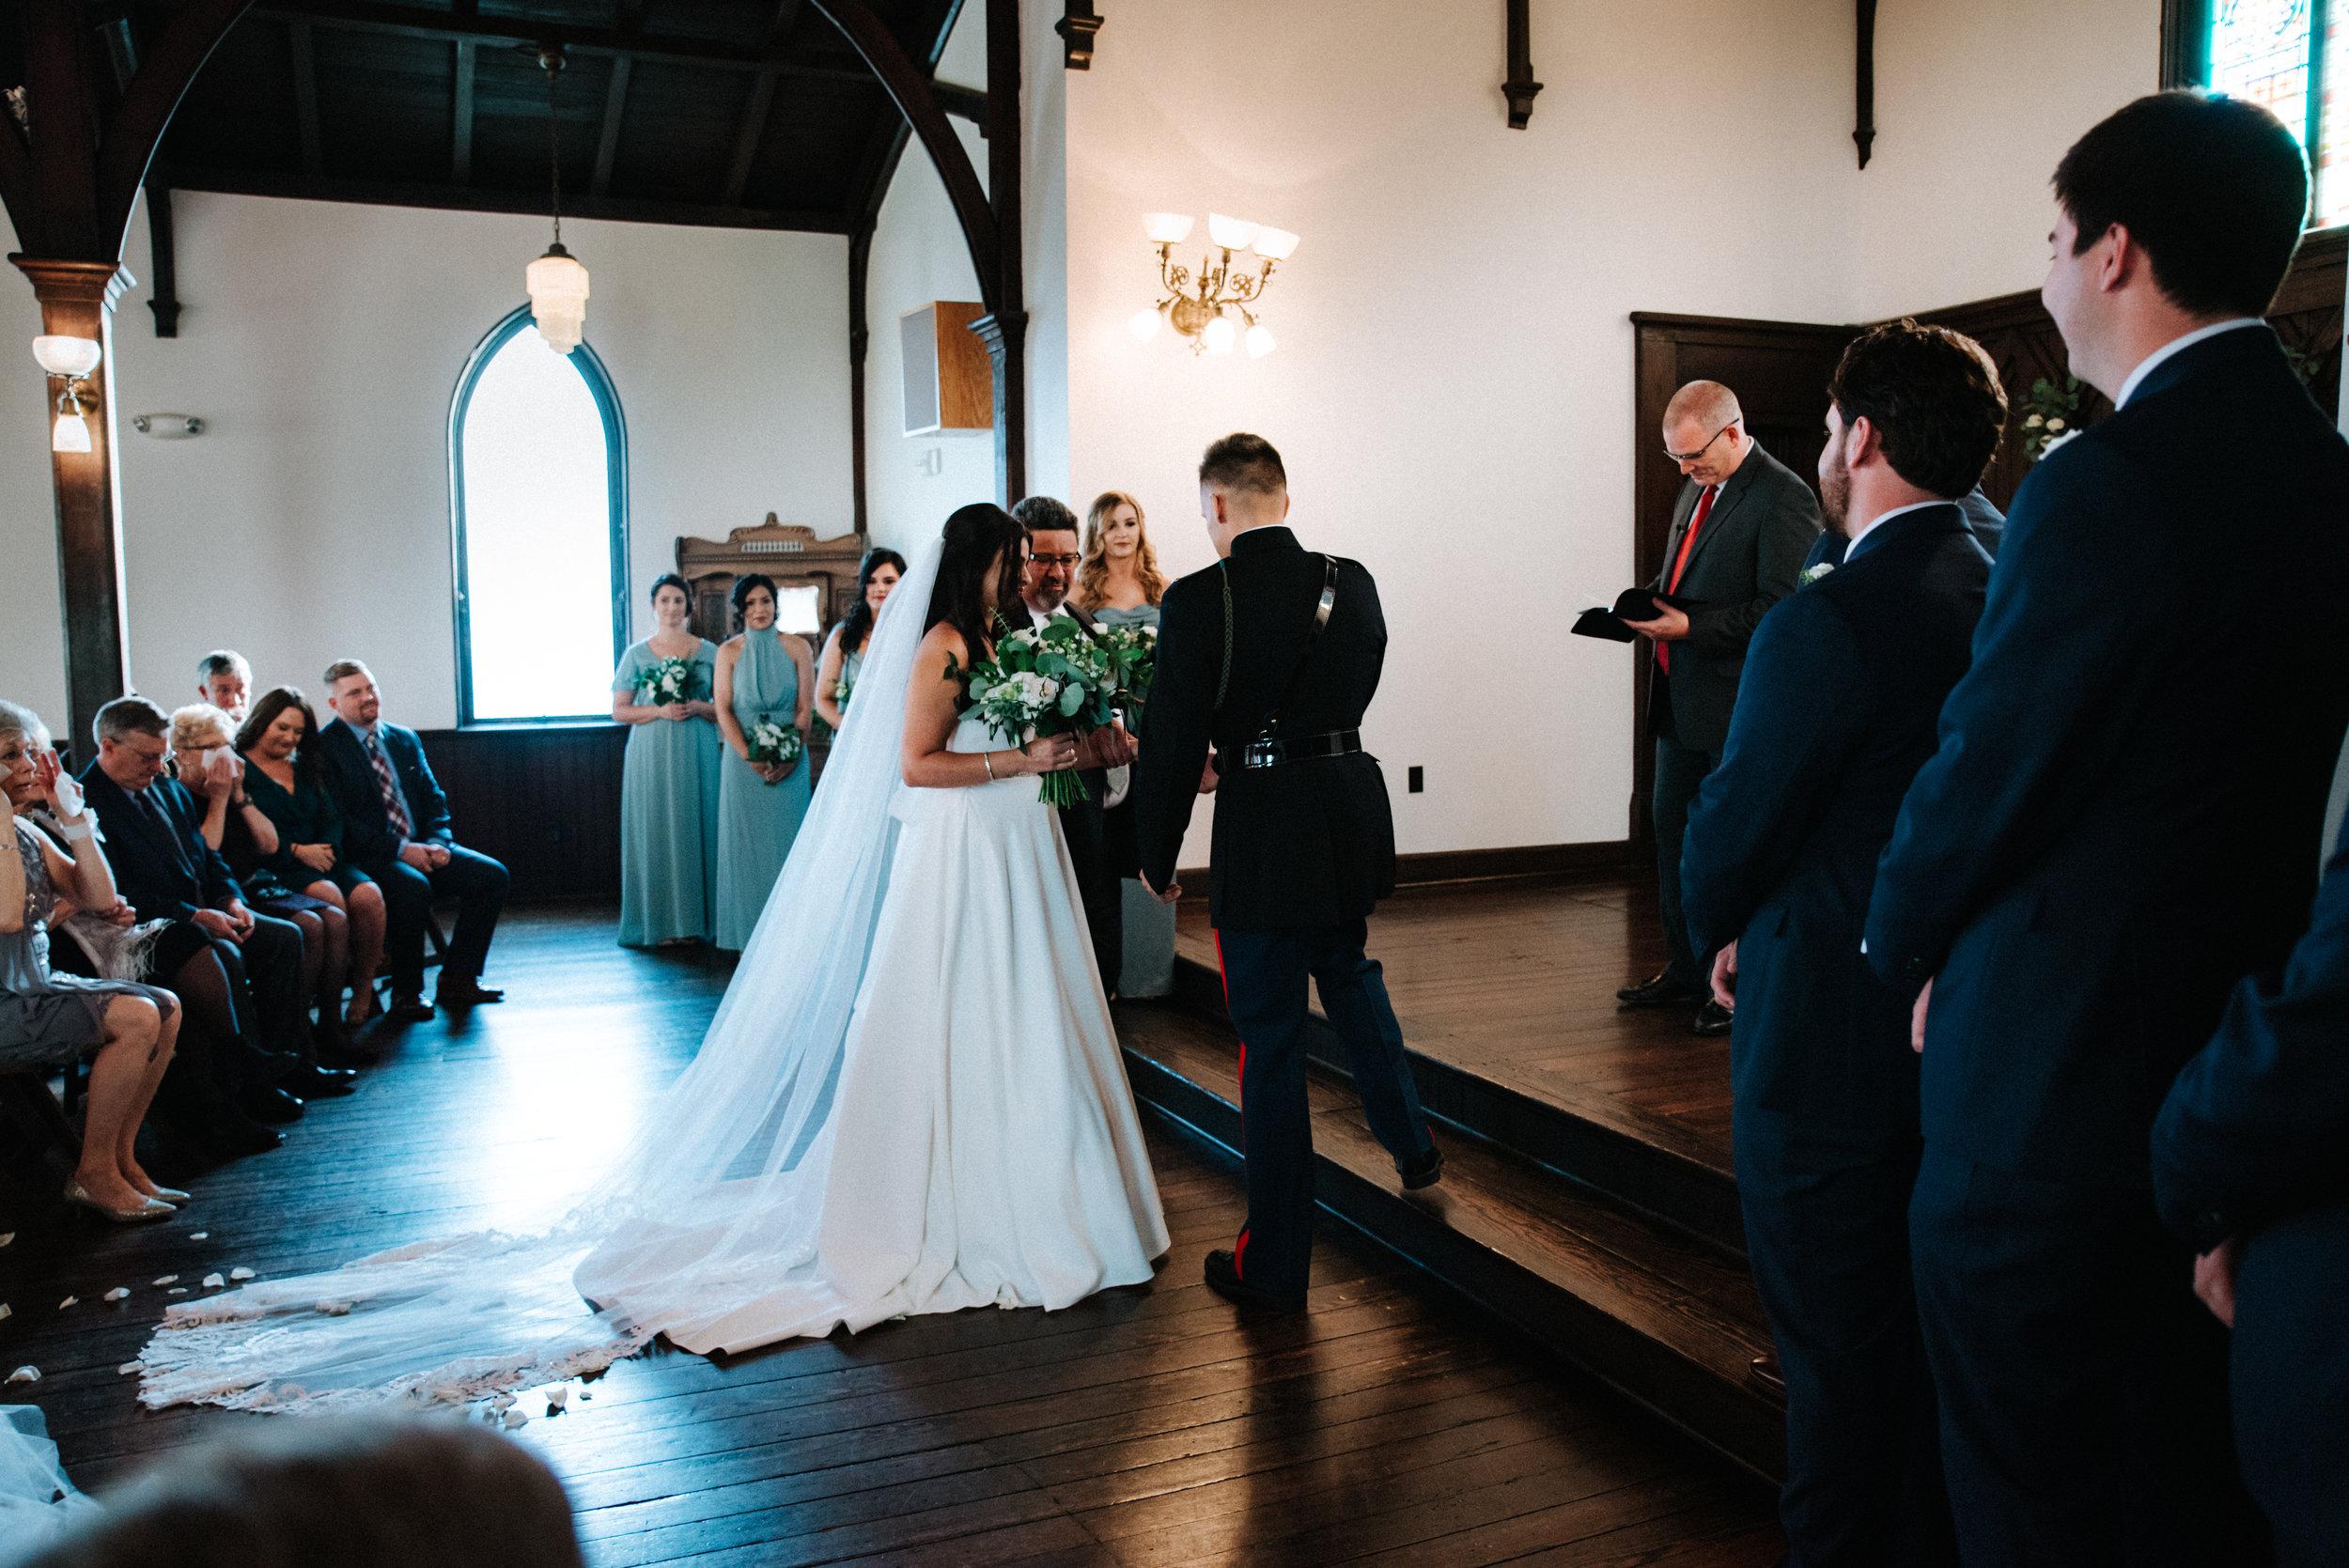 +Raleigh Wedding +North Carolina +Photographer +Wedding Photographer +Engagement Photographer +All Saints Chapel-6744.jpg